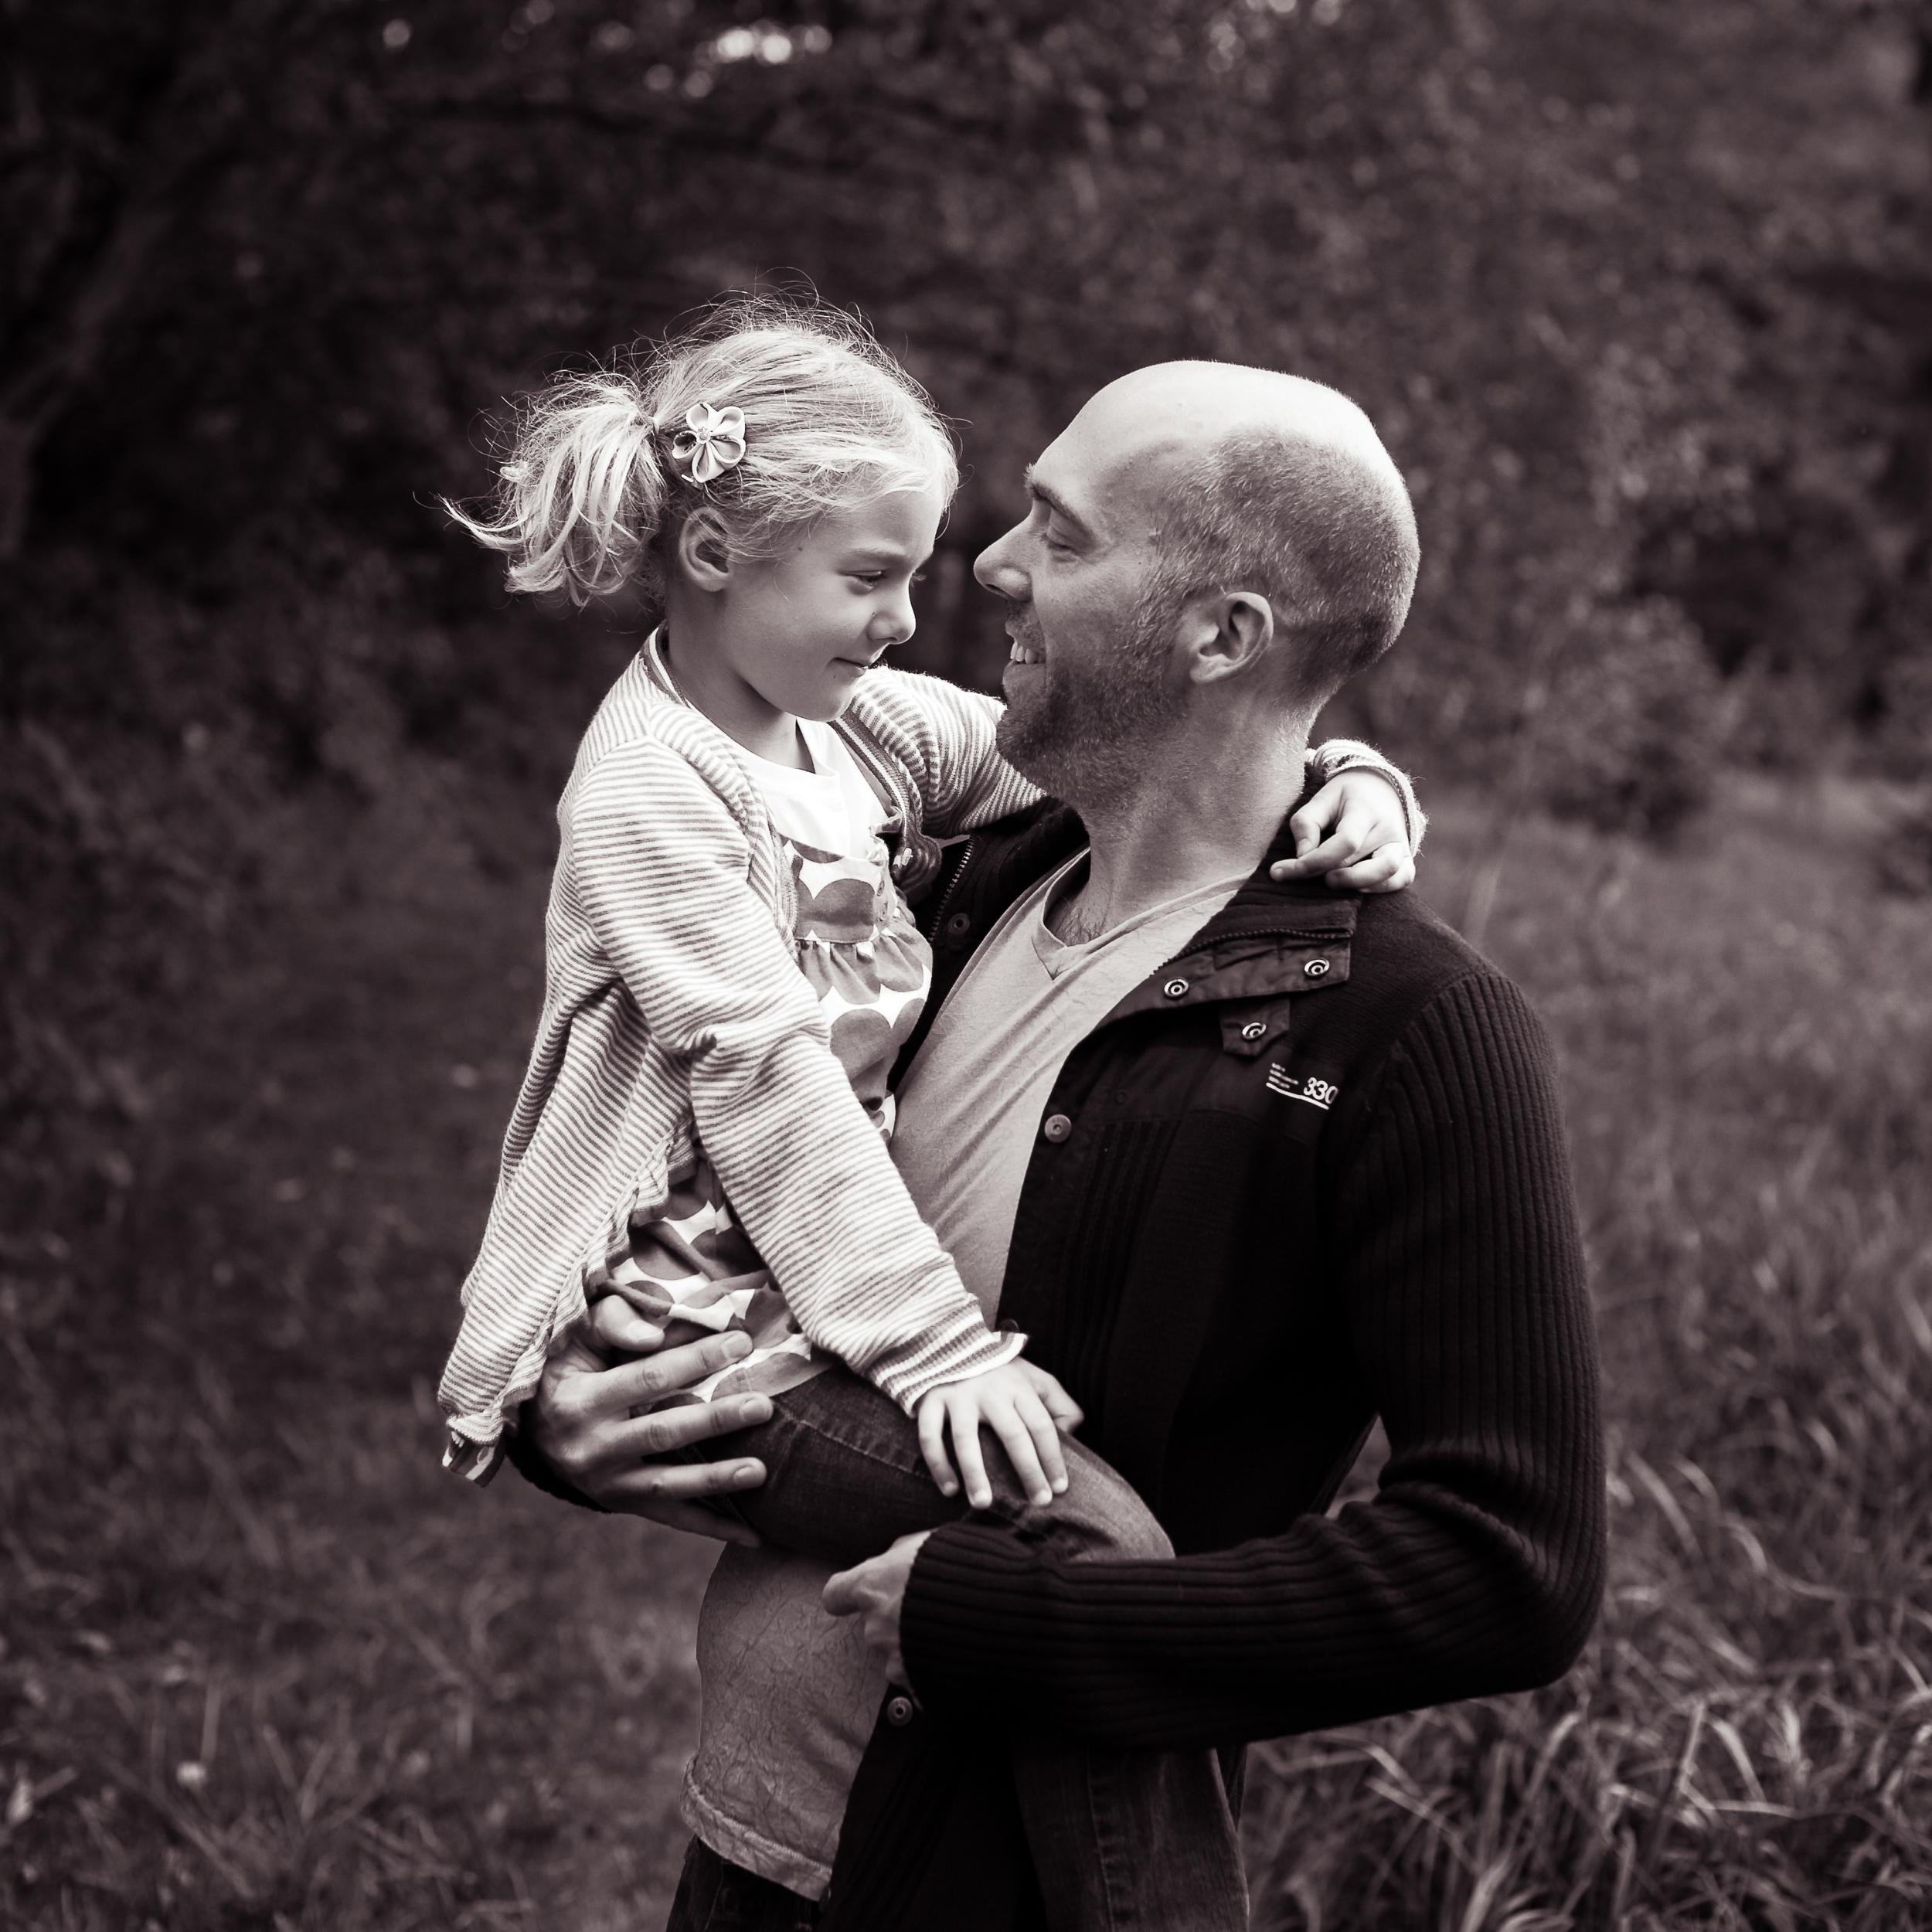 seattle-family-portrait-photographer-6.jpg